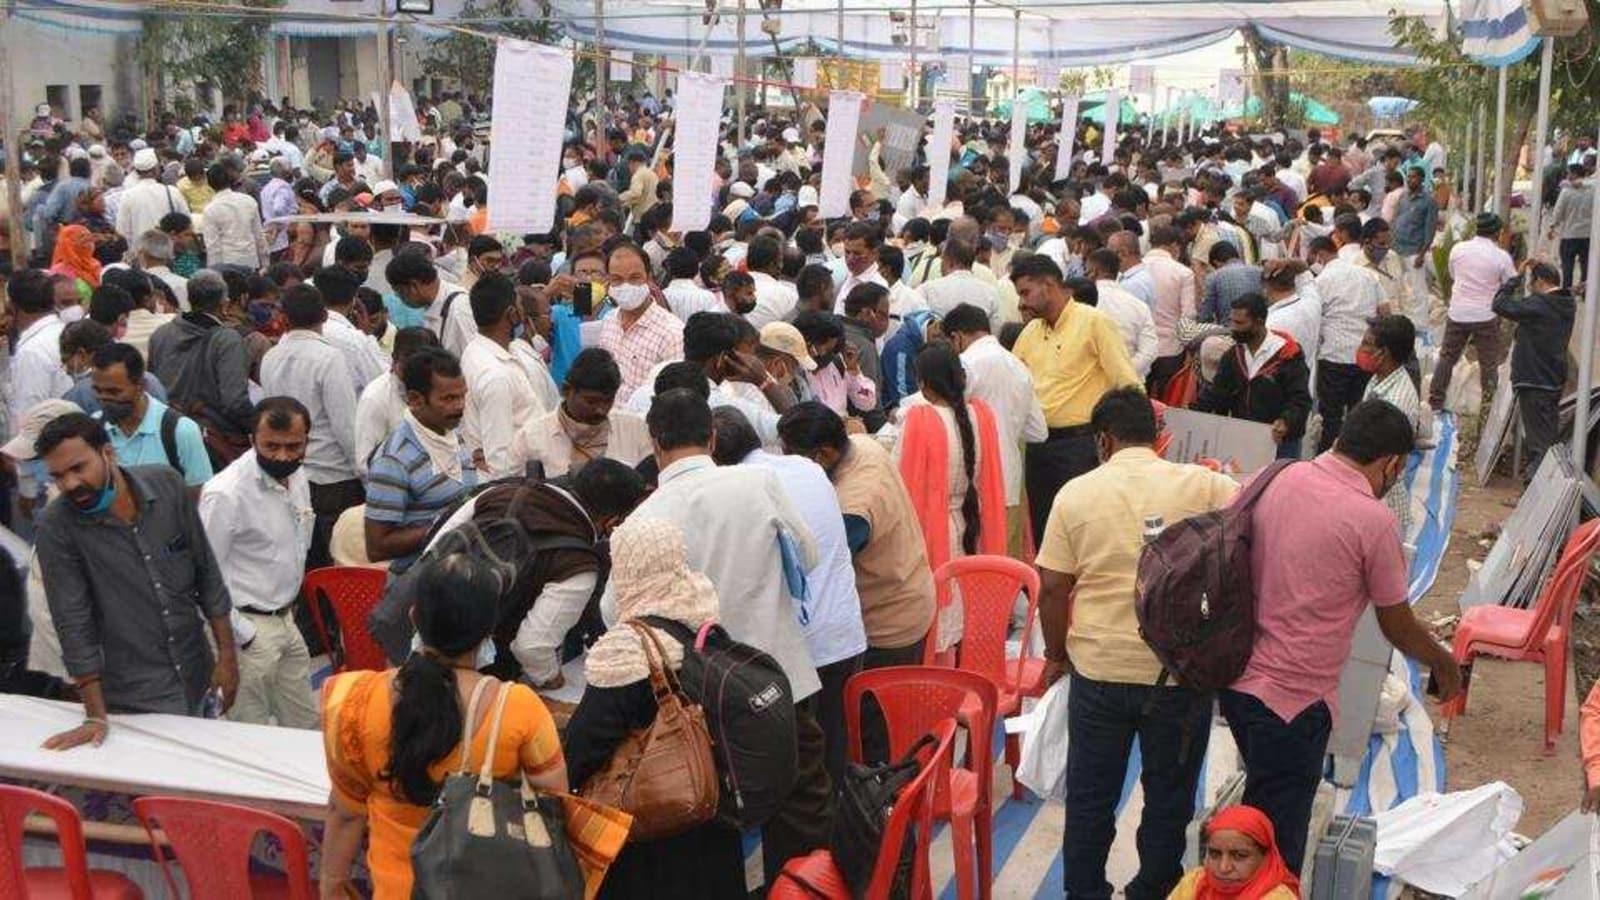 Maharashtra Panchayat Election Results 2021 Live: Shiv Sena, BJP neck to  neck with 390 panchayats each | Hindustan Times